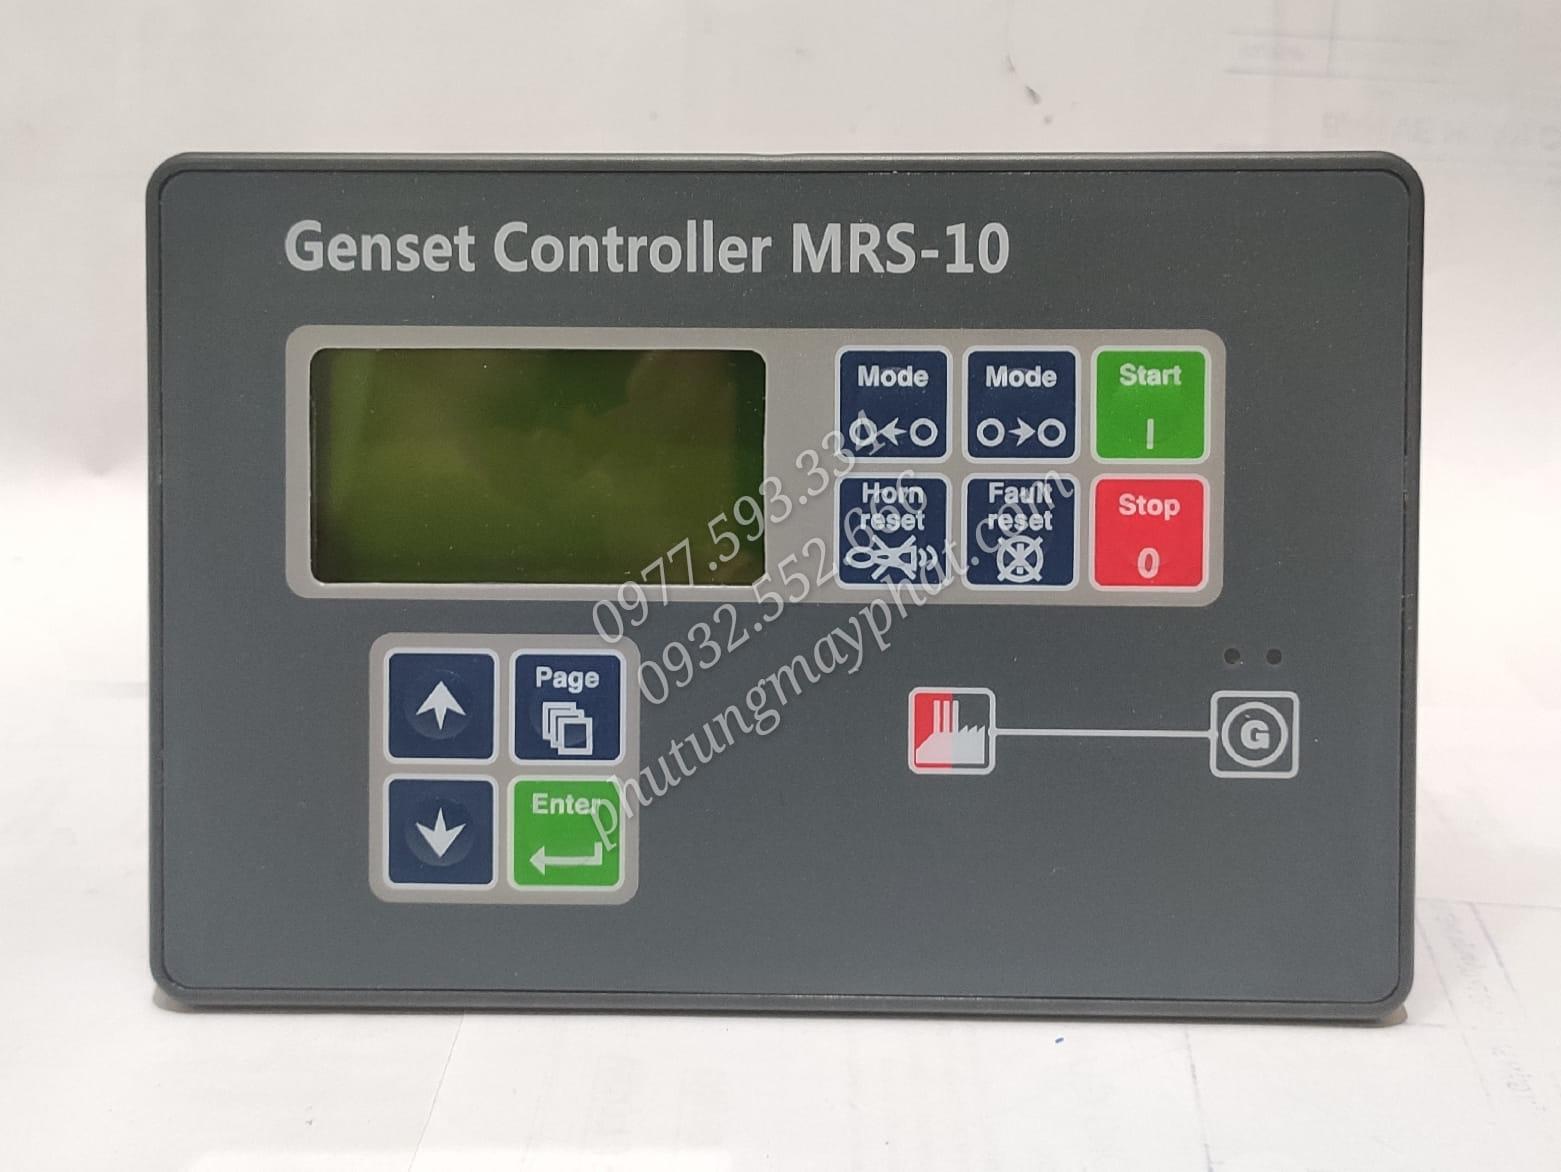 Genset Controller MRS-10